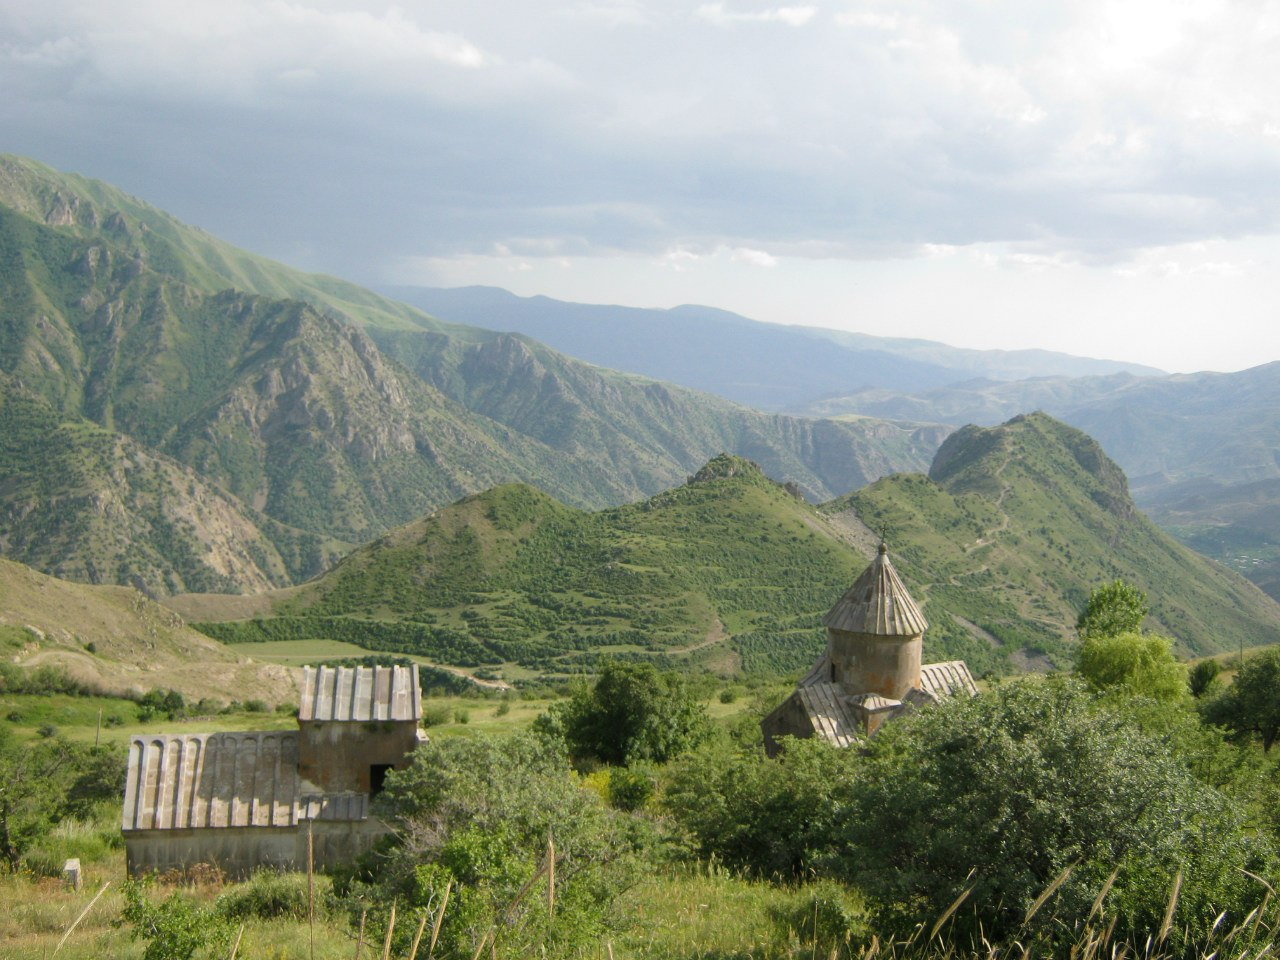 монастырь Цахацкар и крепость Смбатаберд